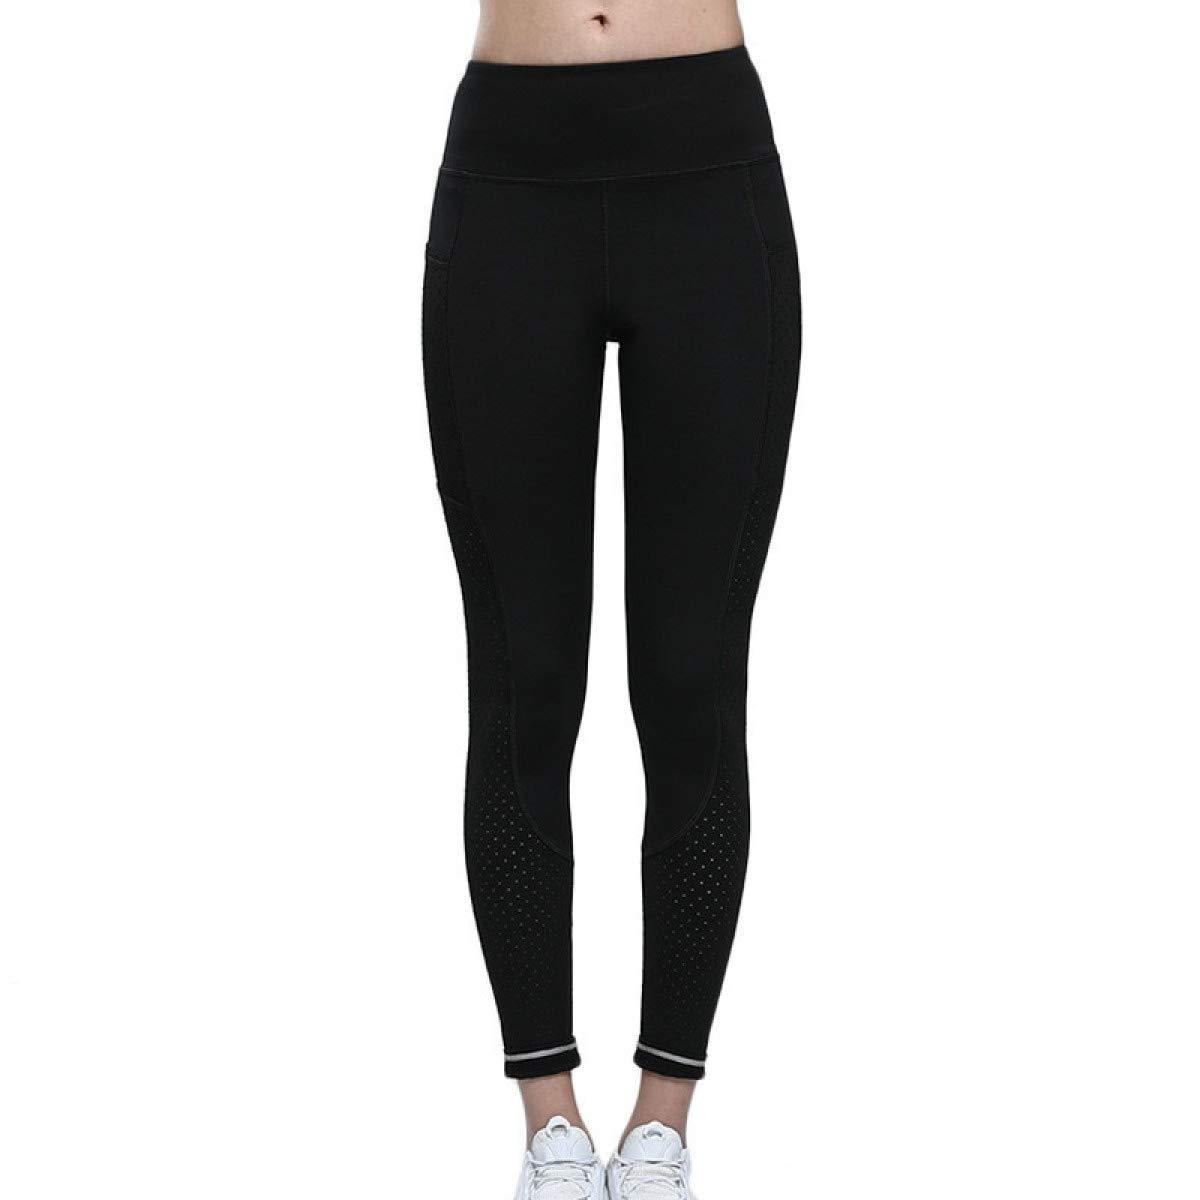 ead17a1ac2291 Amazon.com: MIKI SHOP Leggings for Women Running Jogger Sport ...